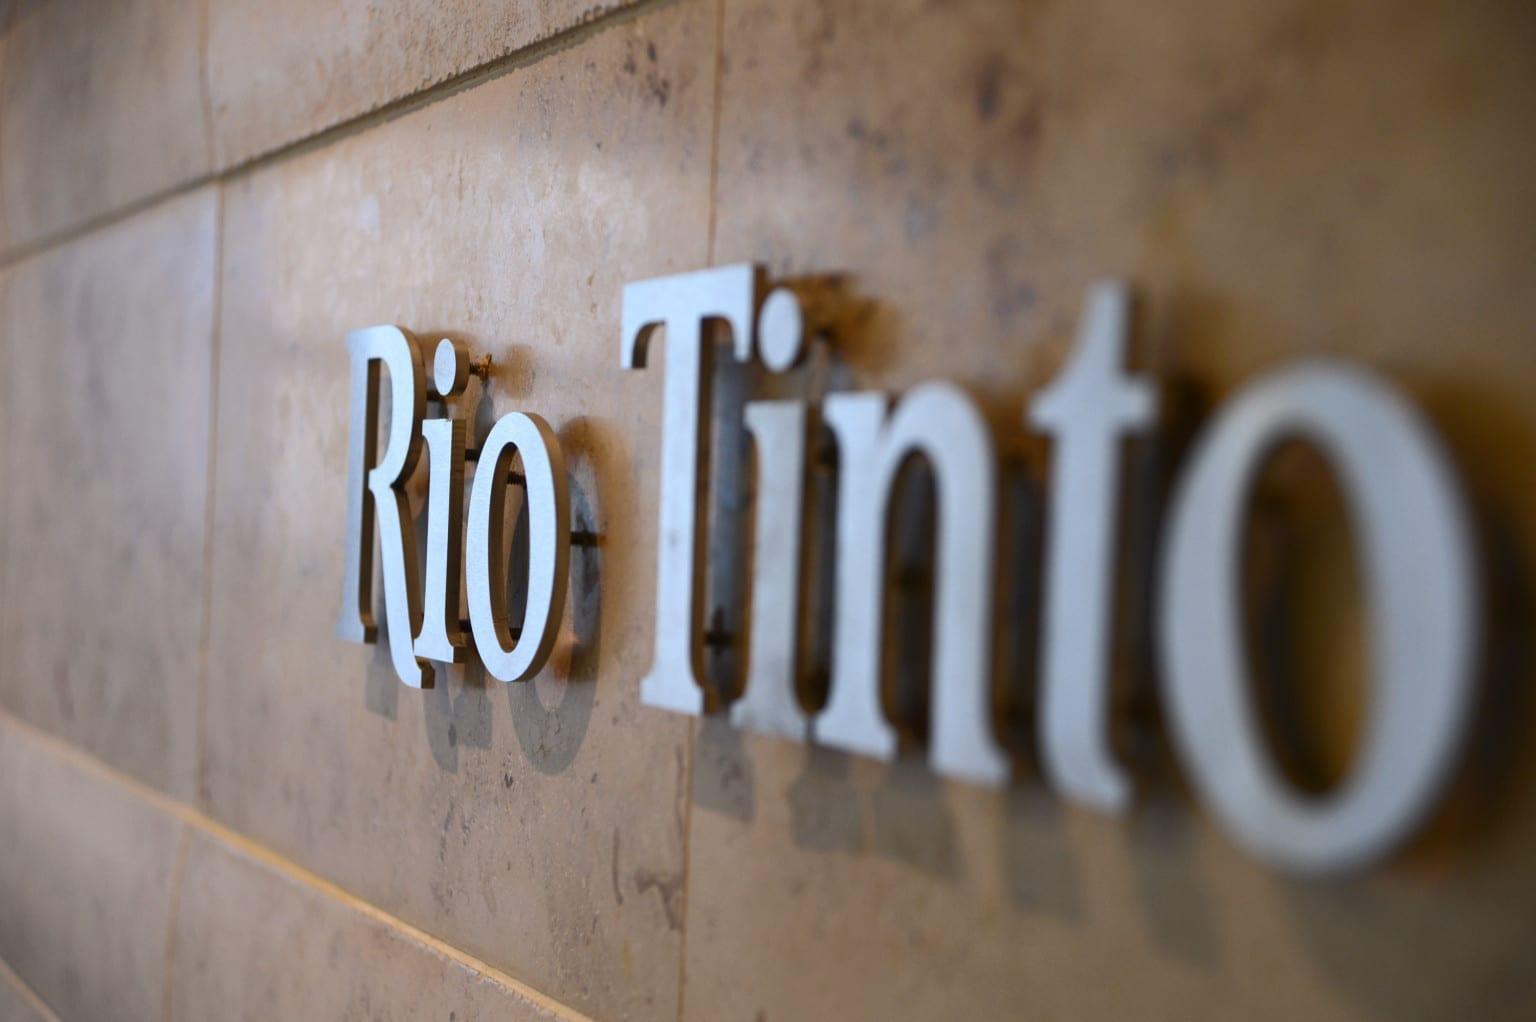 Rio Tinto gives away giant iron ore field